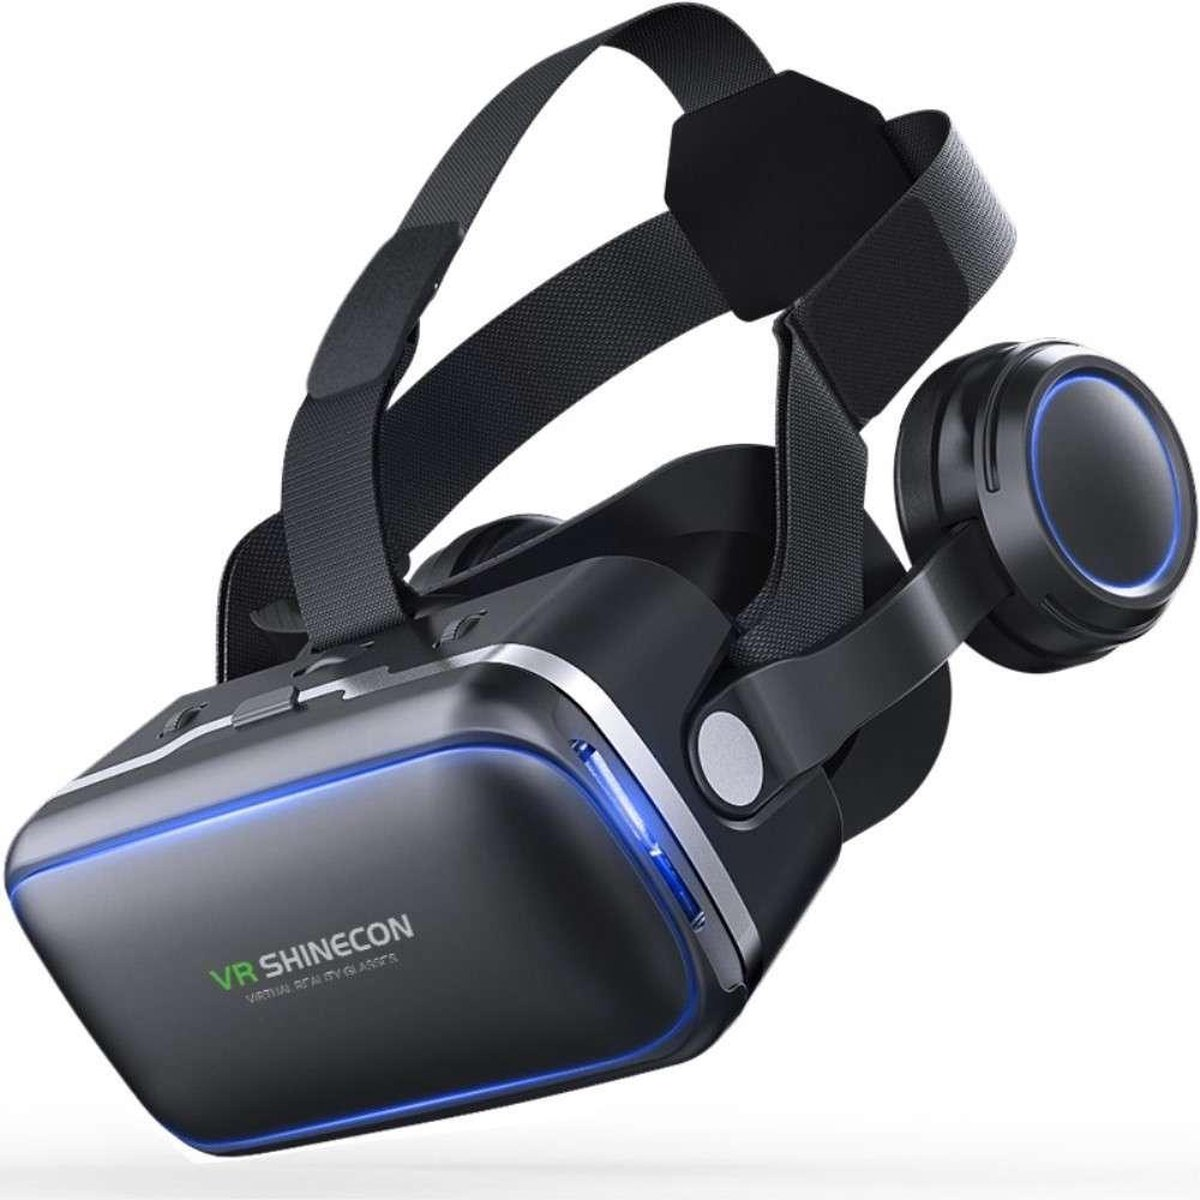 VR SHINECON Virtual Reality Bril met Earphons - 4 tot 6 inch smartphones - Black